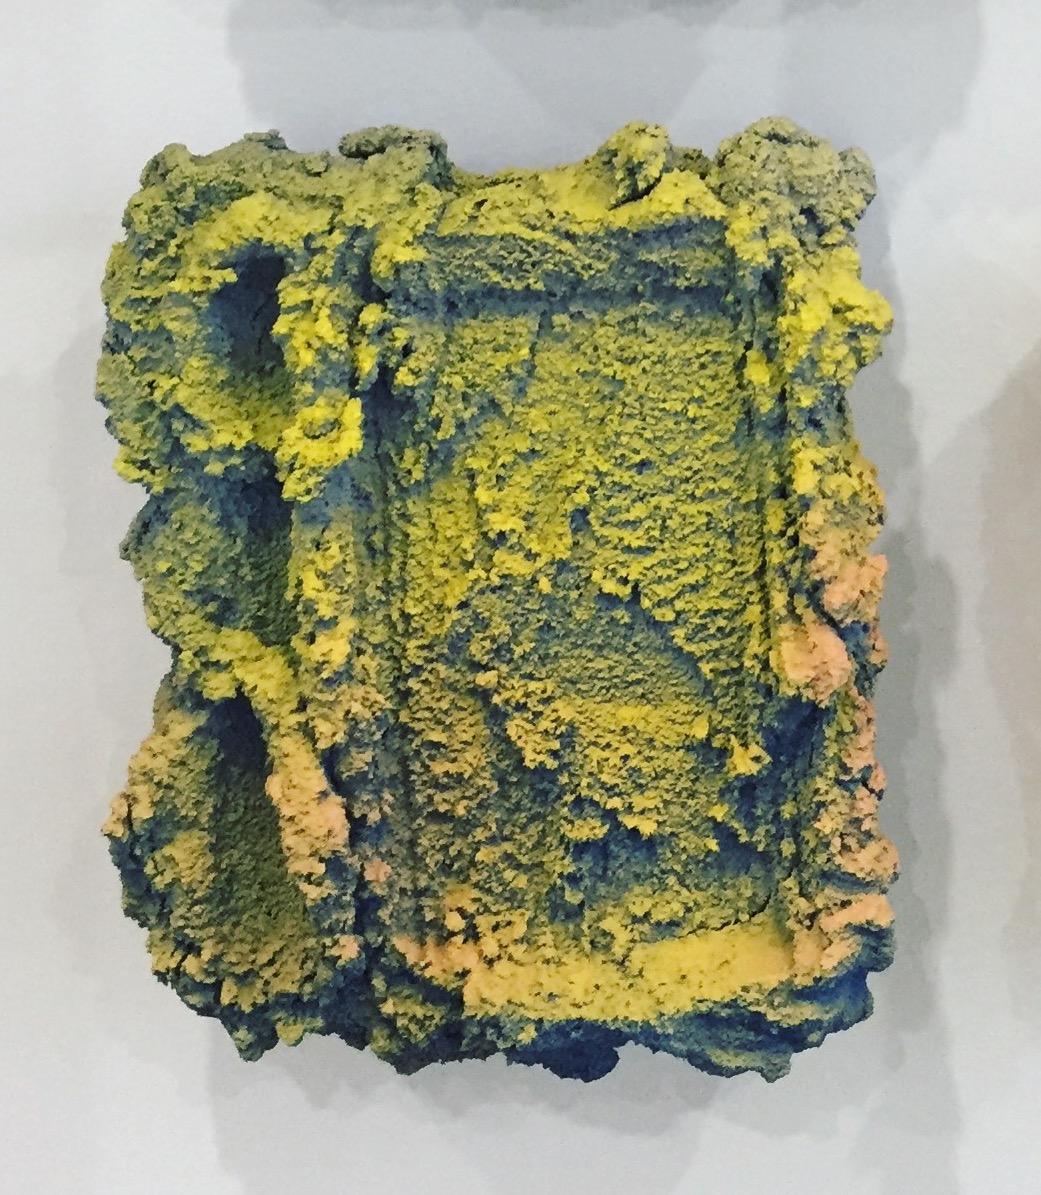 Brian Rochefort  Tablet 238 , 2017 ceramic, glaze 9 x 7 x 3 in.